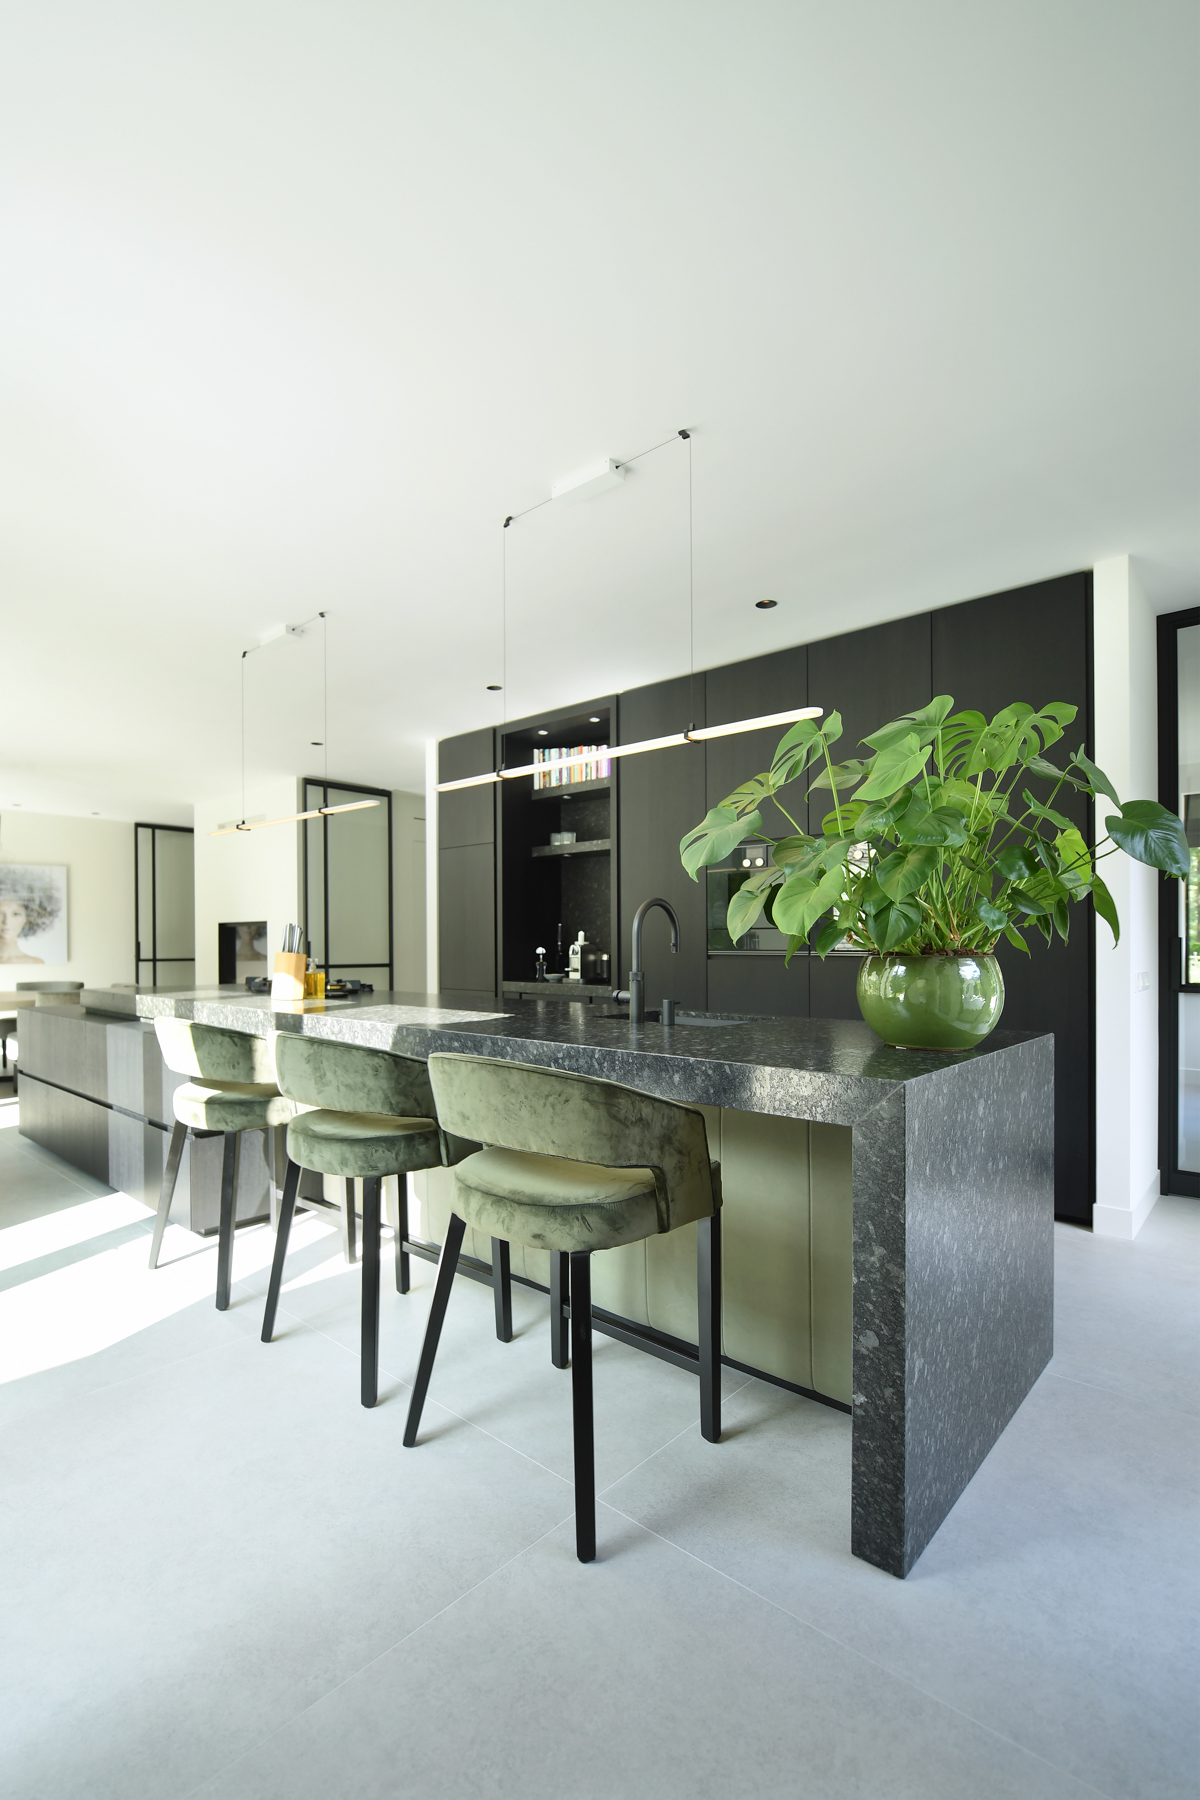 Modern herenhuis met aansprekende architectuur (34)